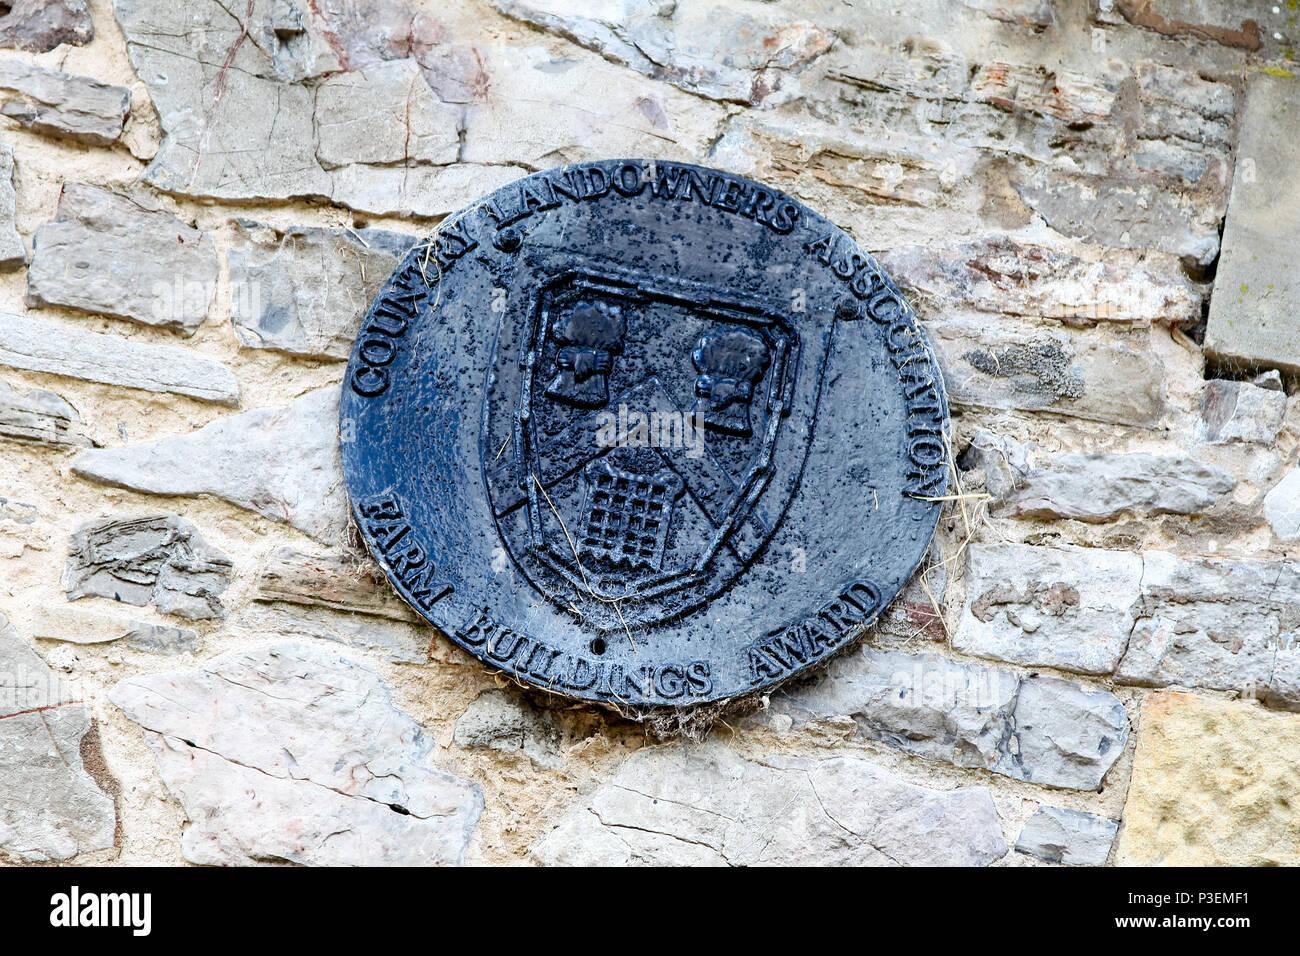 A Country Landowners Association Farm Buildings Award plaque on a stone farm building, Staffordshire, England, UK - Stock Image